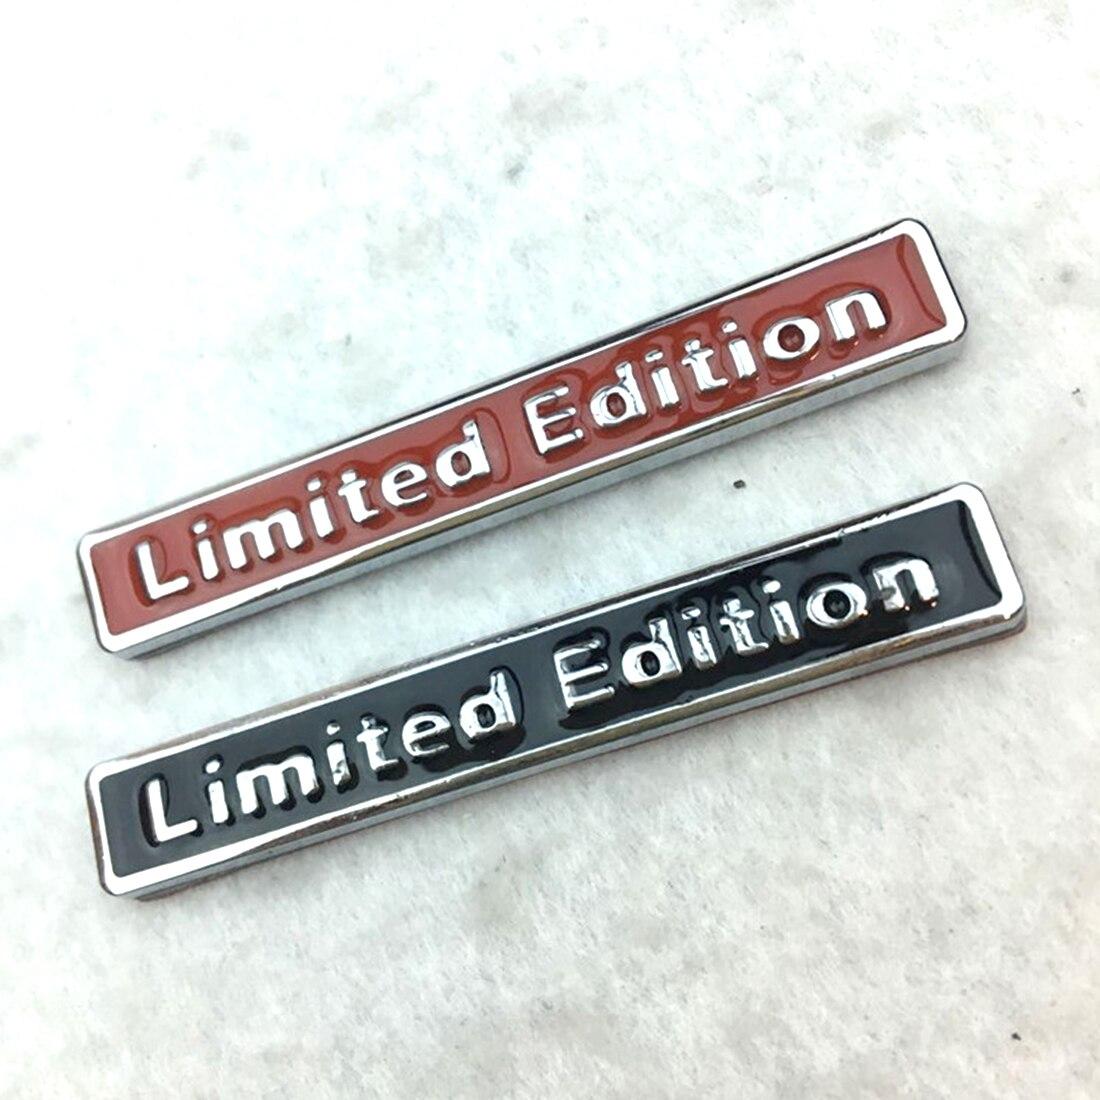 Hot Sale 3D Metal Chrome Limited Edition Auto Car Sticker Badge Decal Motorcycle Stickers Emblem For Suzuki Honda Kawasaki HARLE